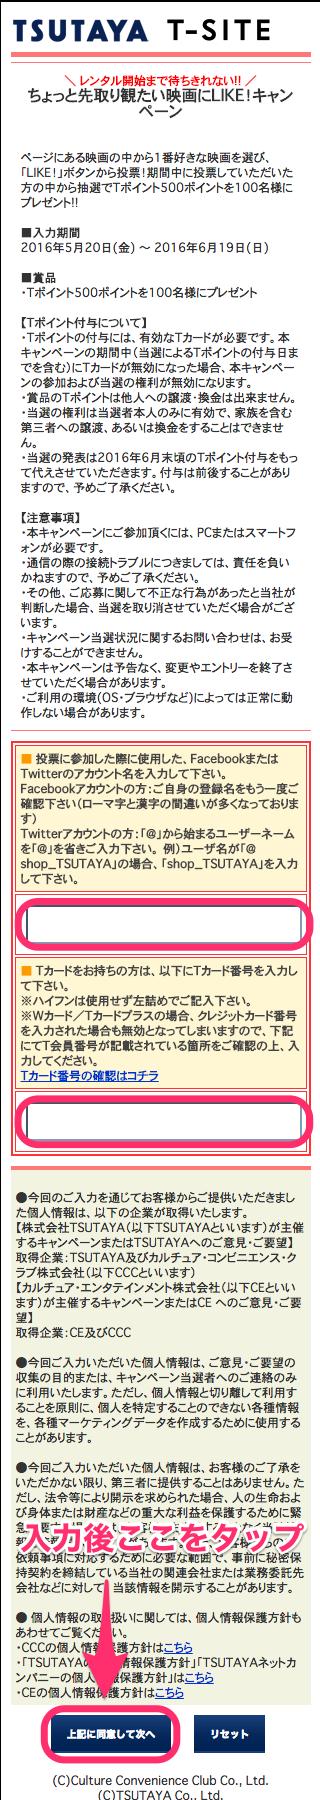 20160527_sp_08